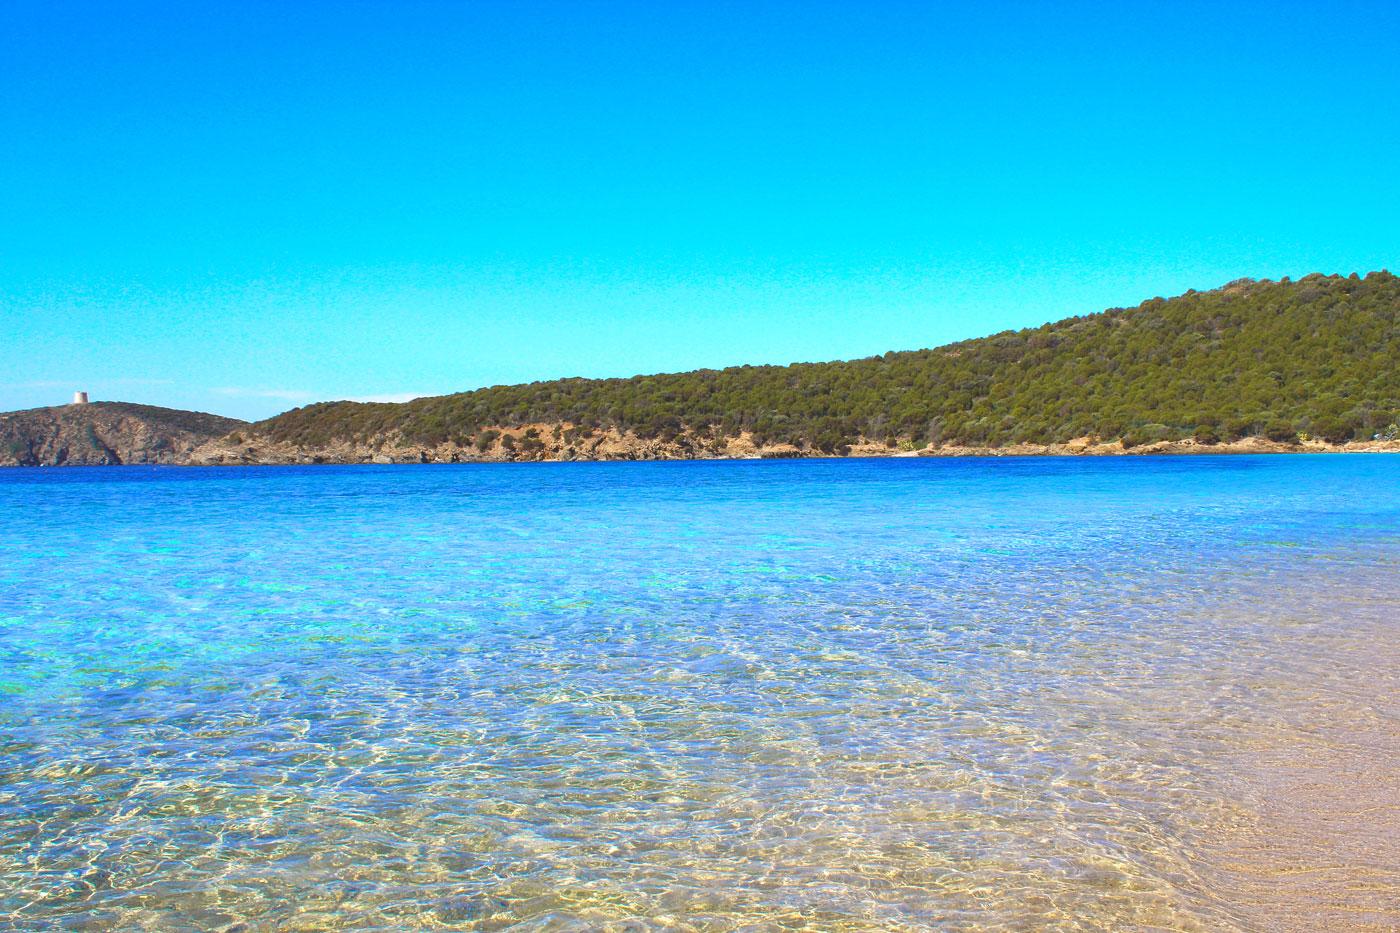 Best Beaches near Cagliari - Tuerredda